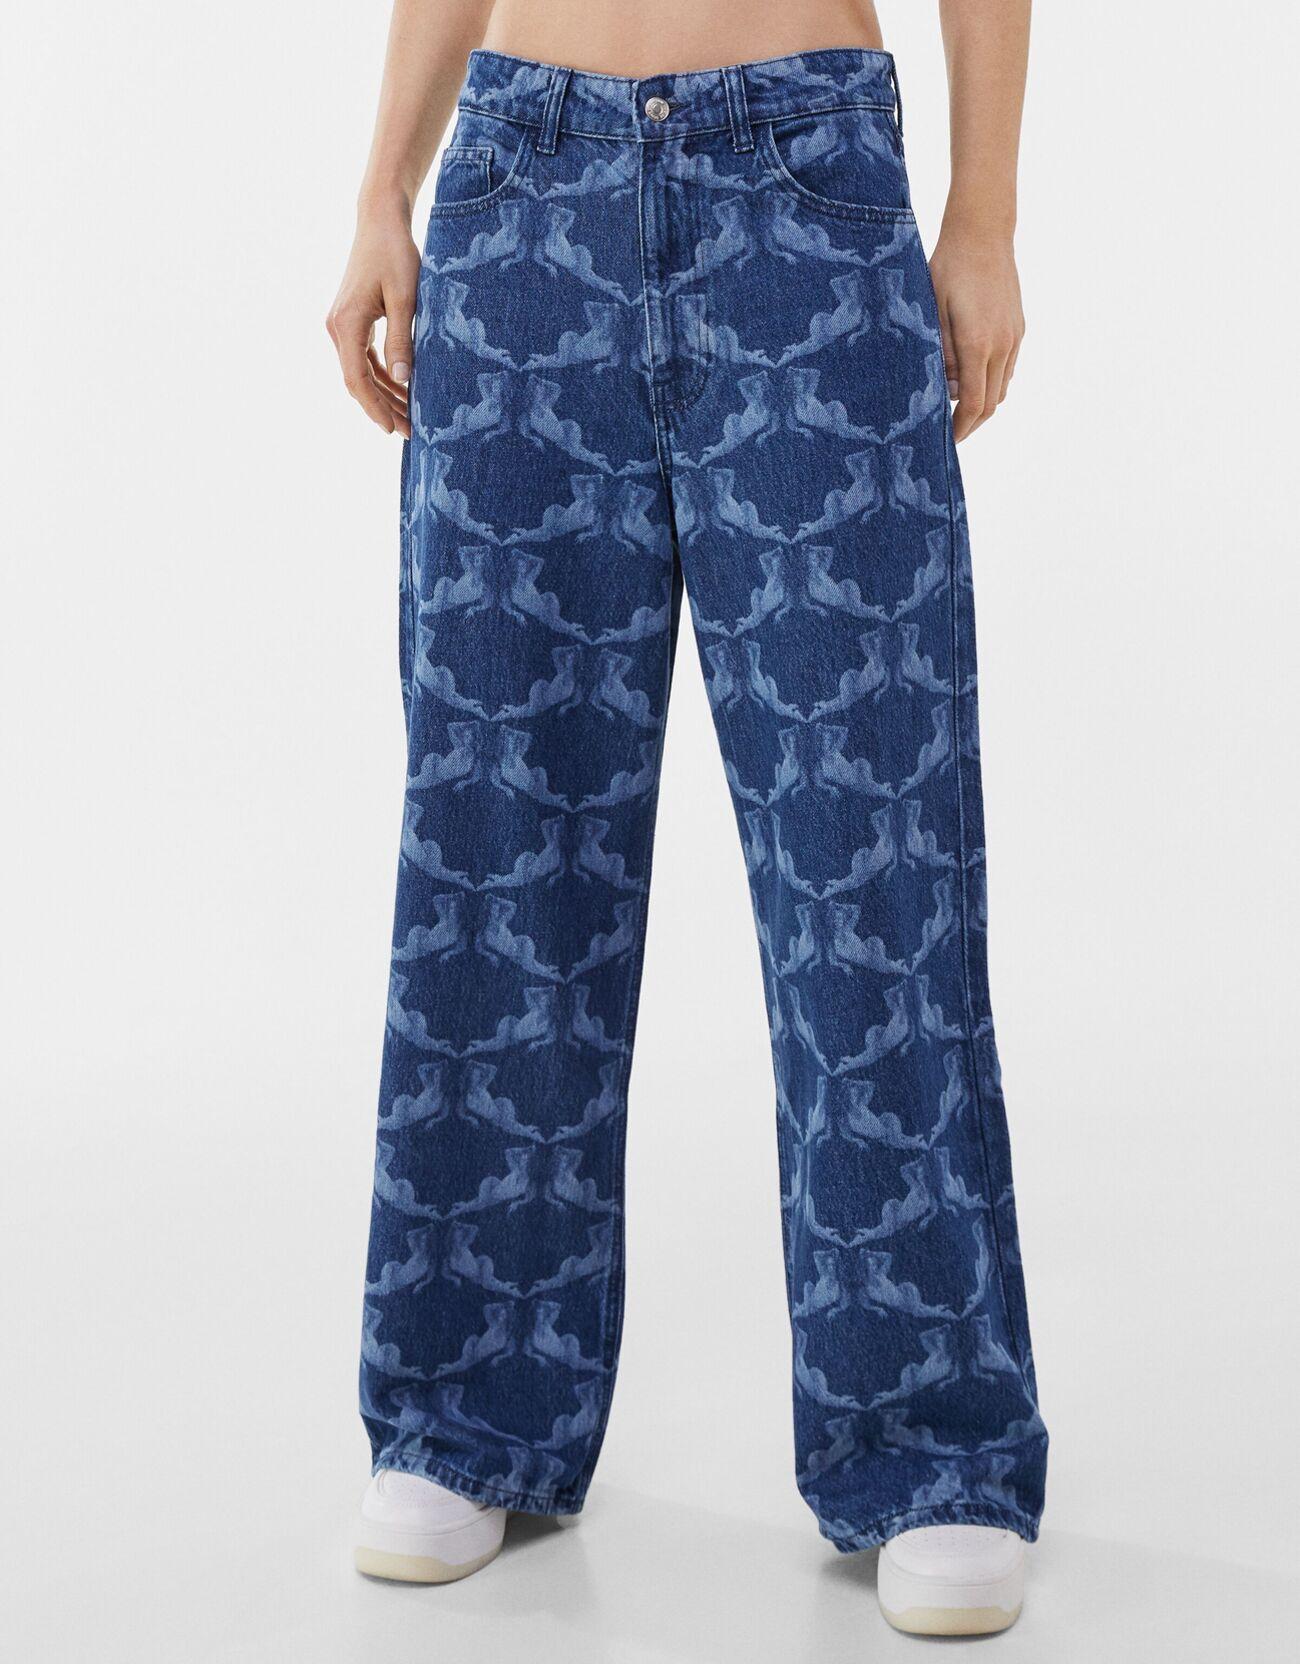 bershka -  Baggy-Jeans Mit Print Paloma Mami X  Damen 40 Ausgewaschenes Blau